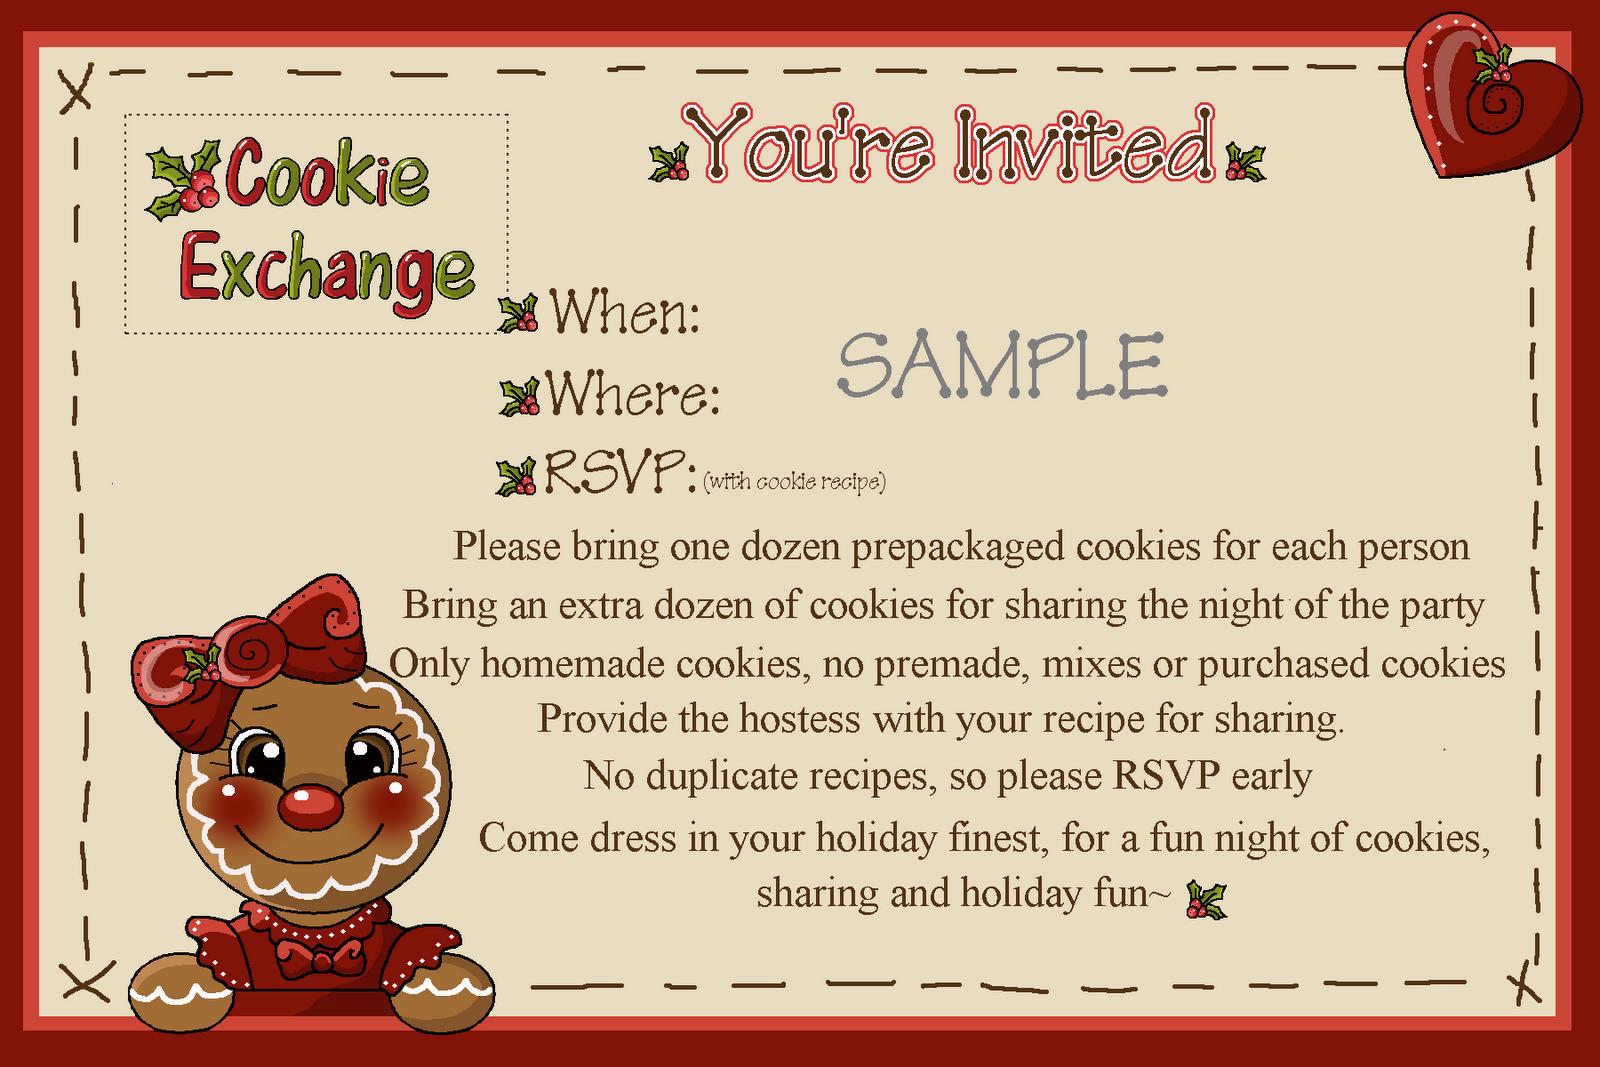 Cookie Exchange Party Invitation Wording